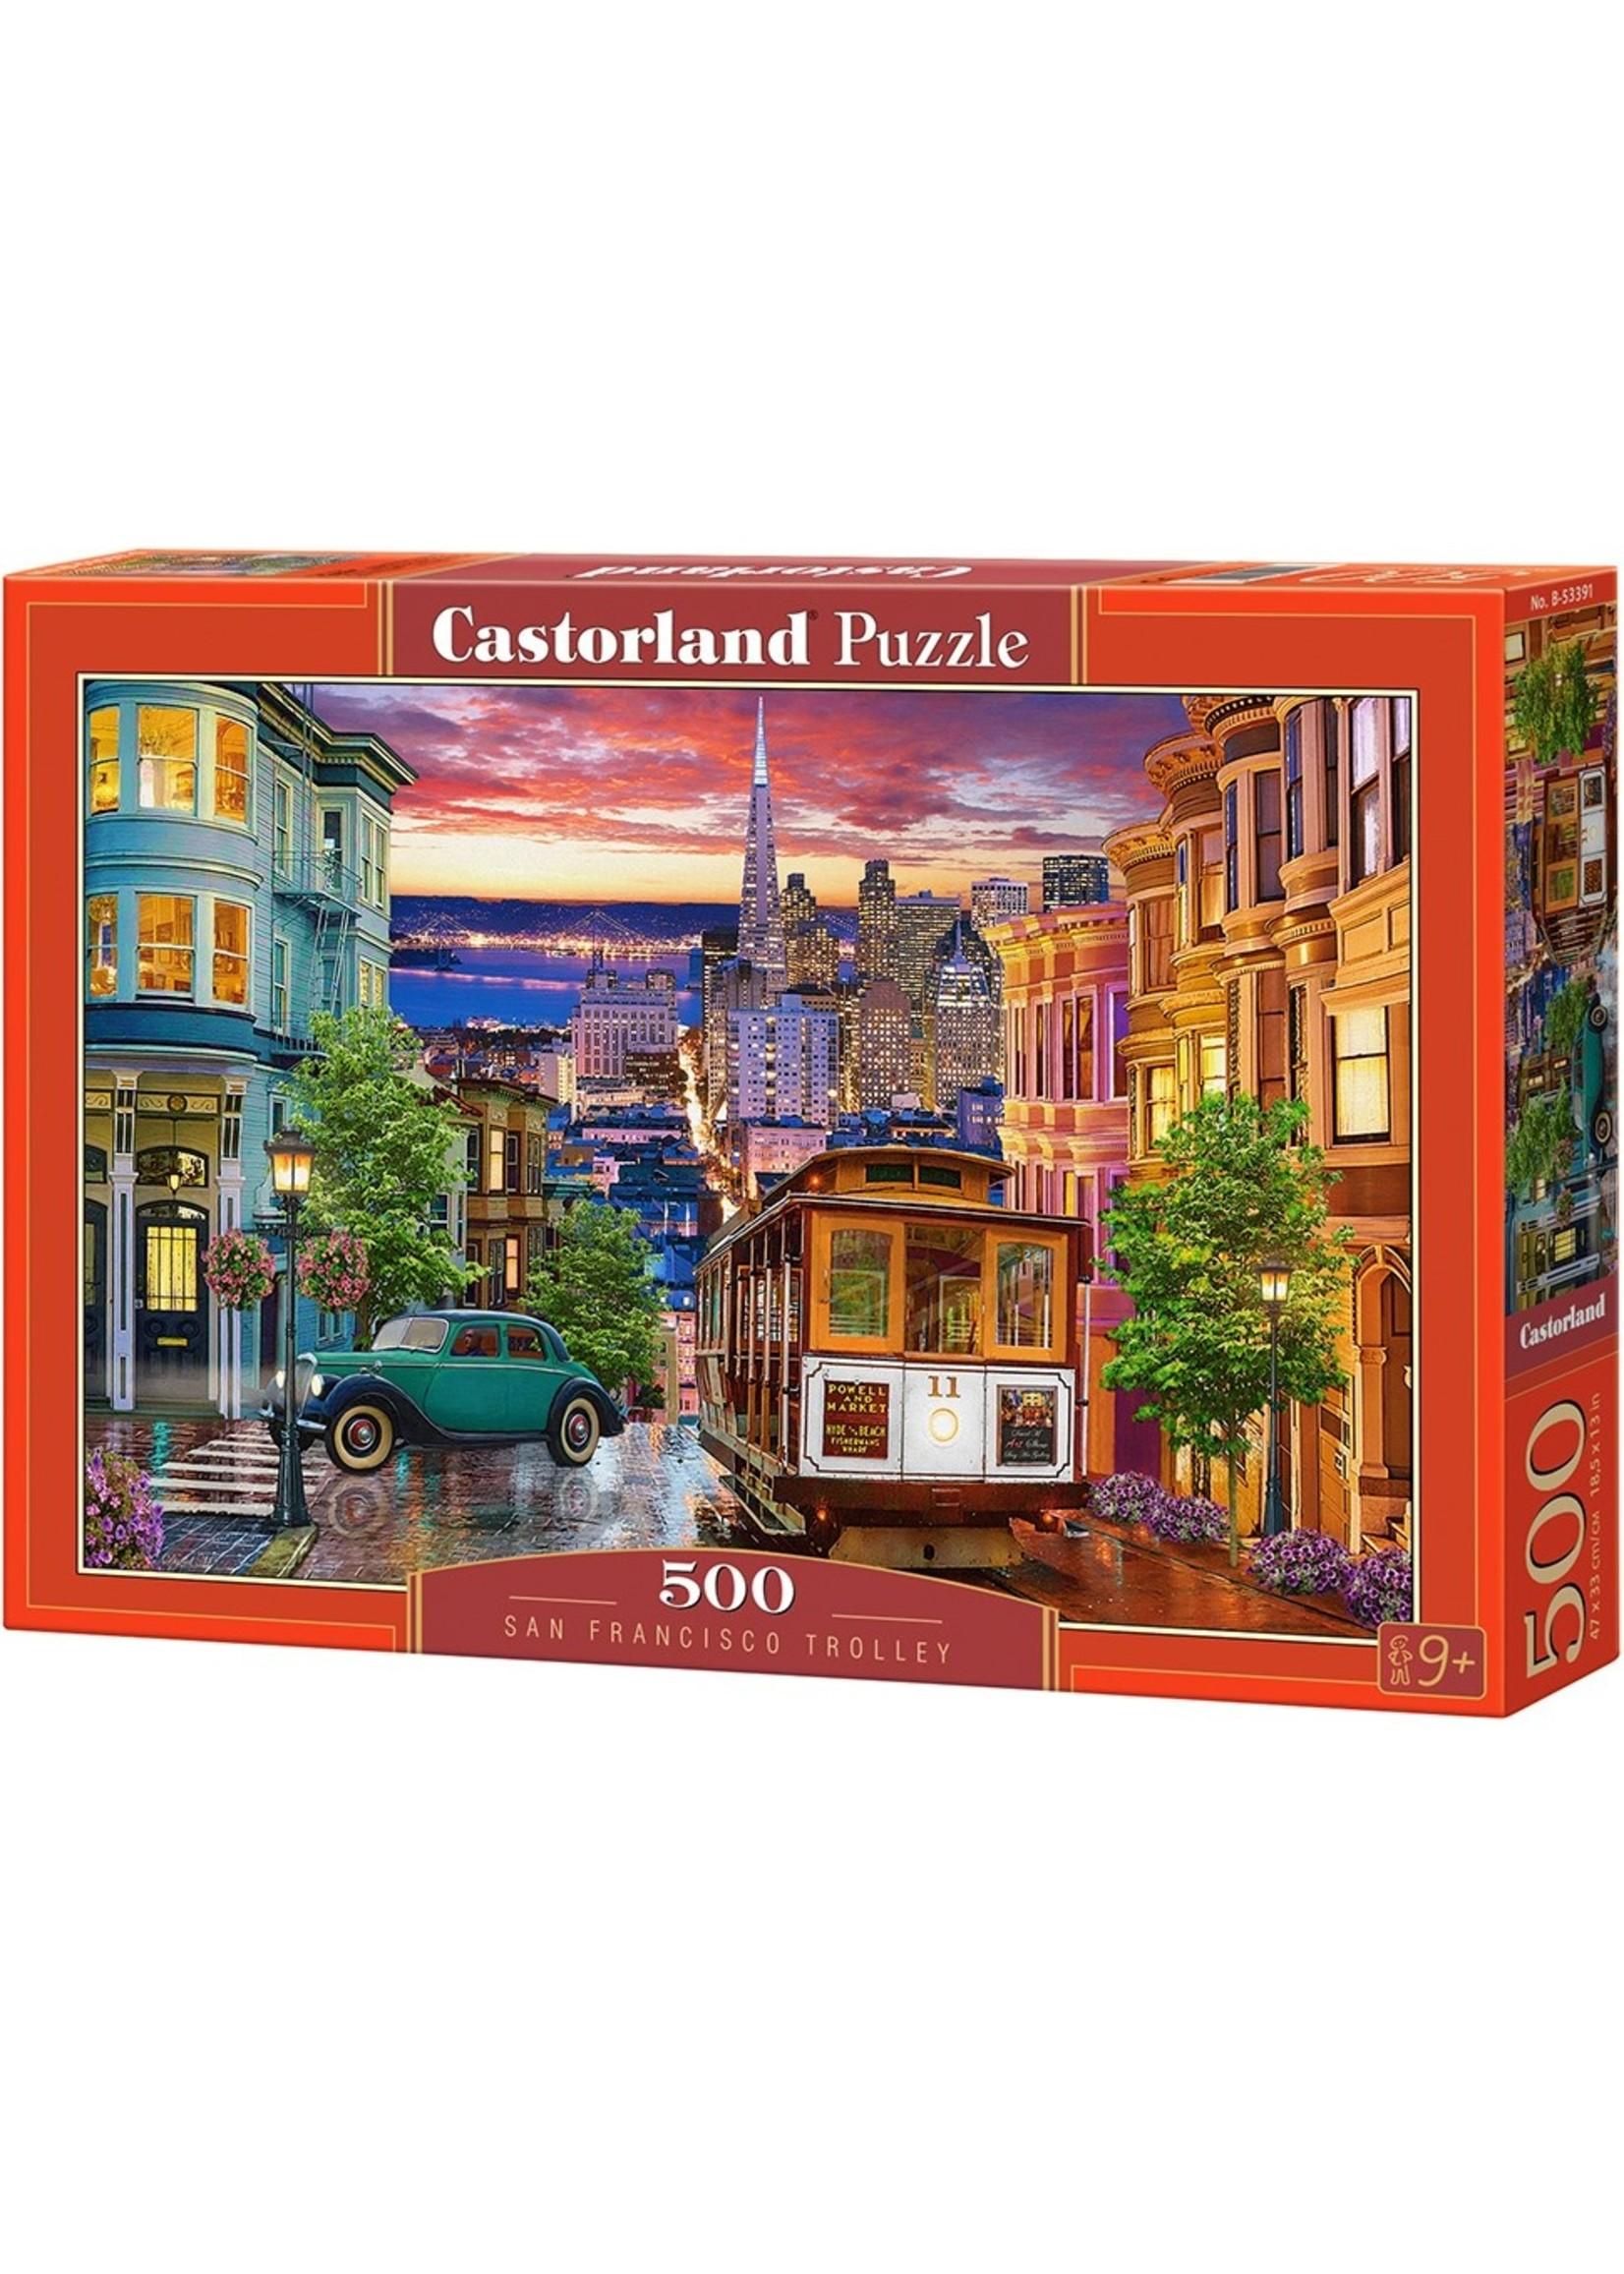 Castorland puzzle San Francisco Trolley 500st